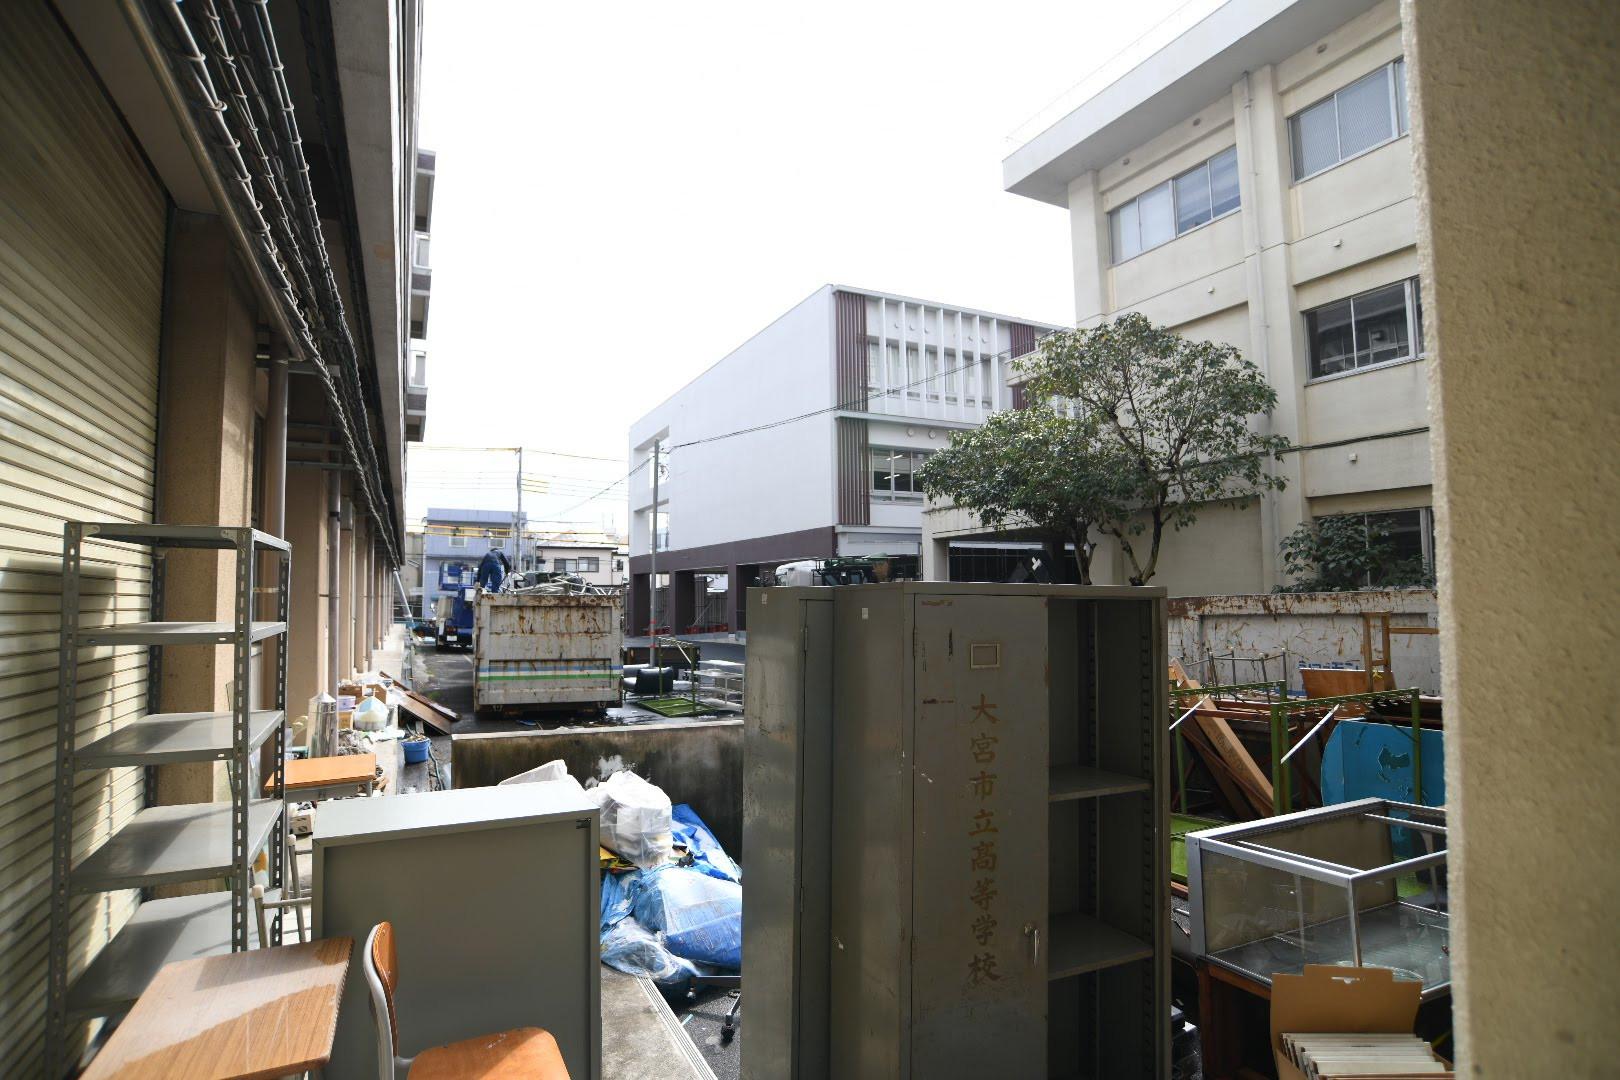 DSC_7871.jpg